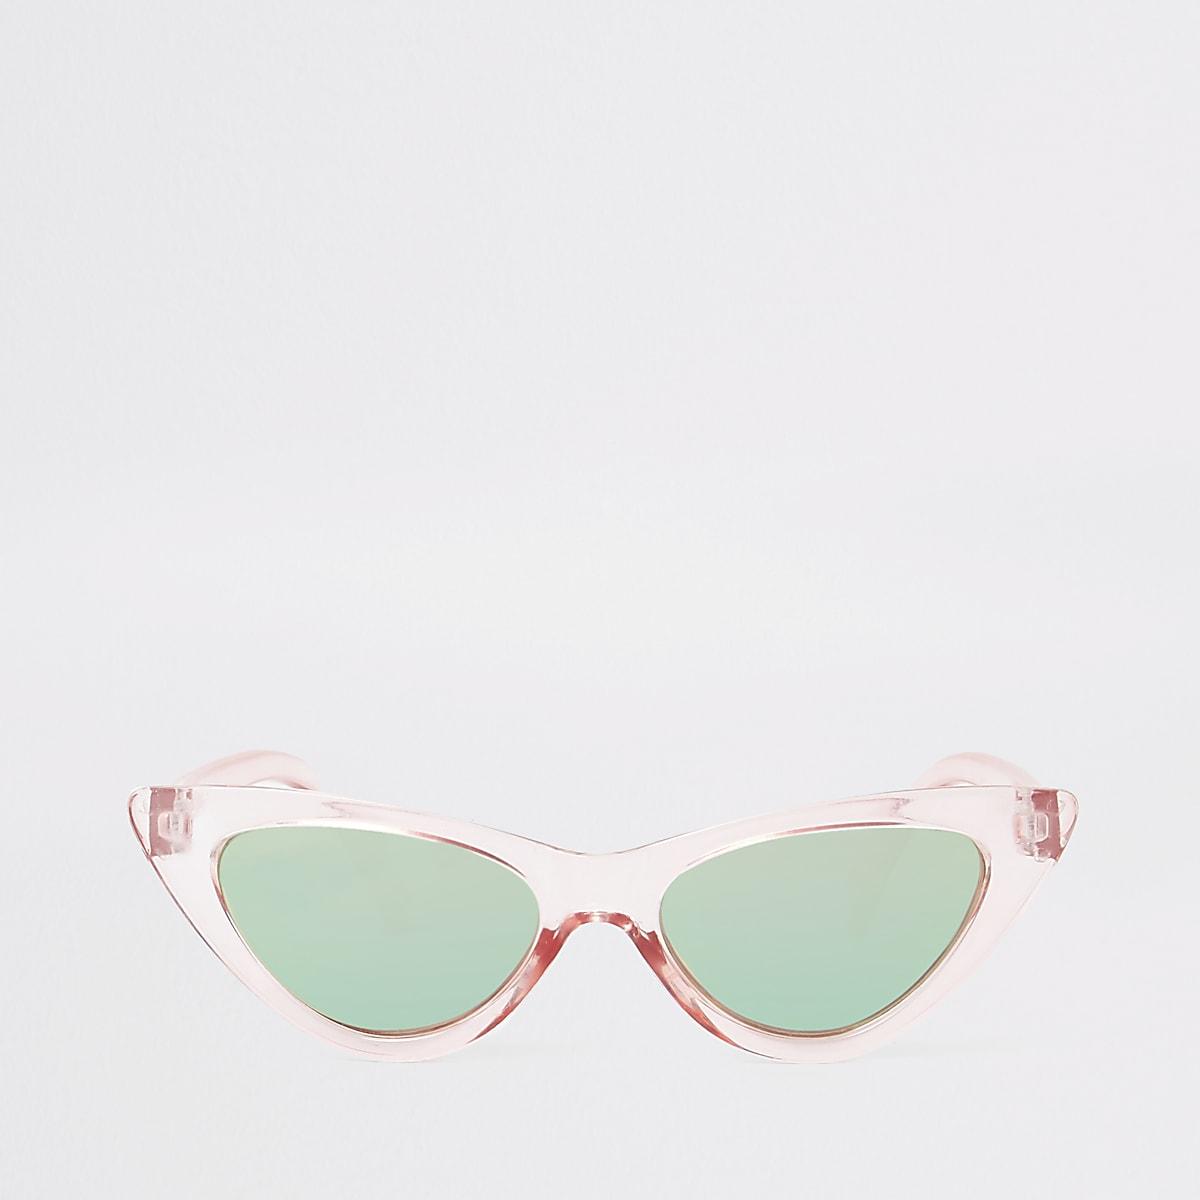 Girls pink cat eye sunglasses